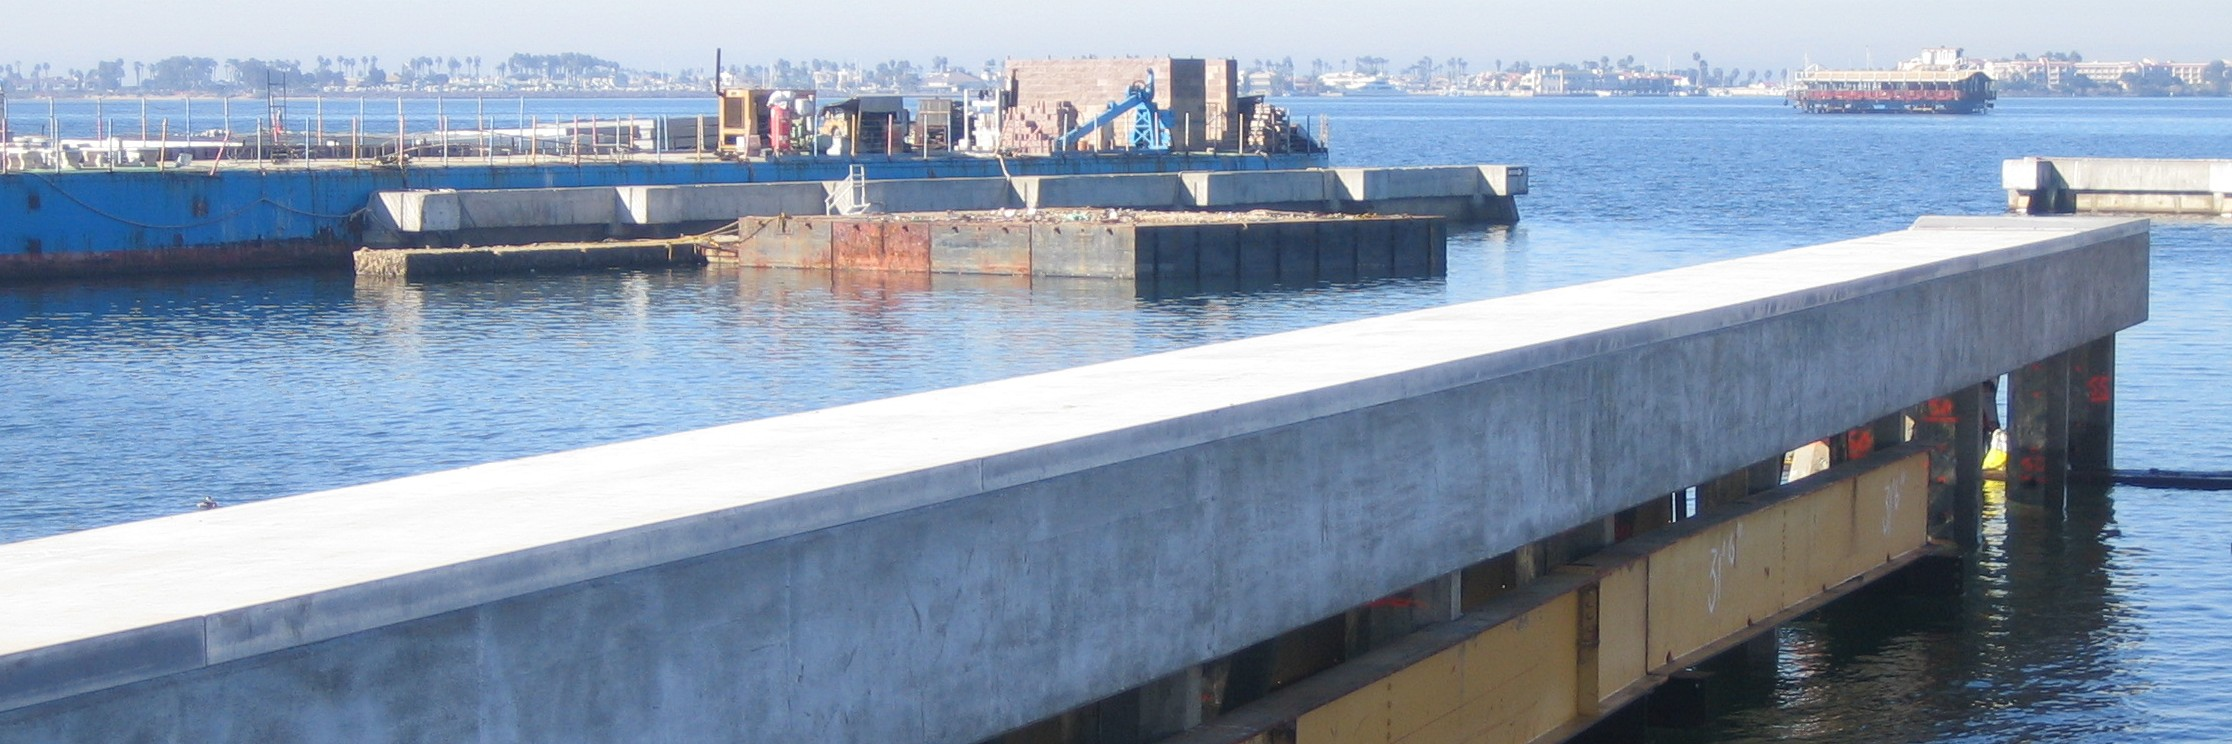 Boat Hoist Pier – 660 MT